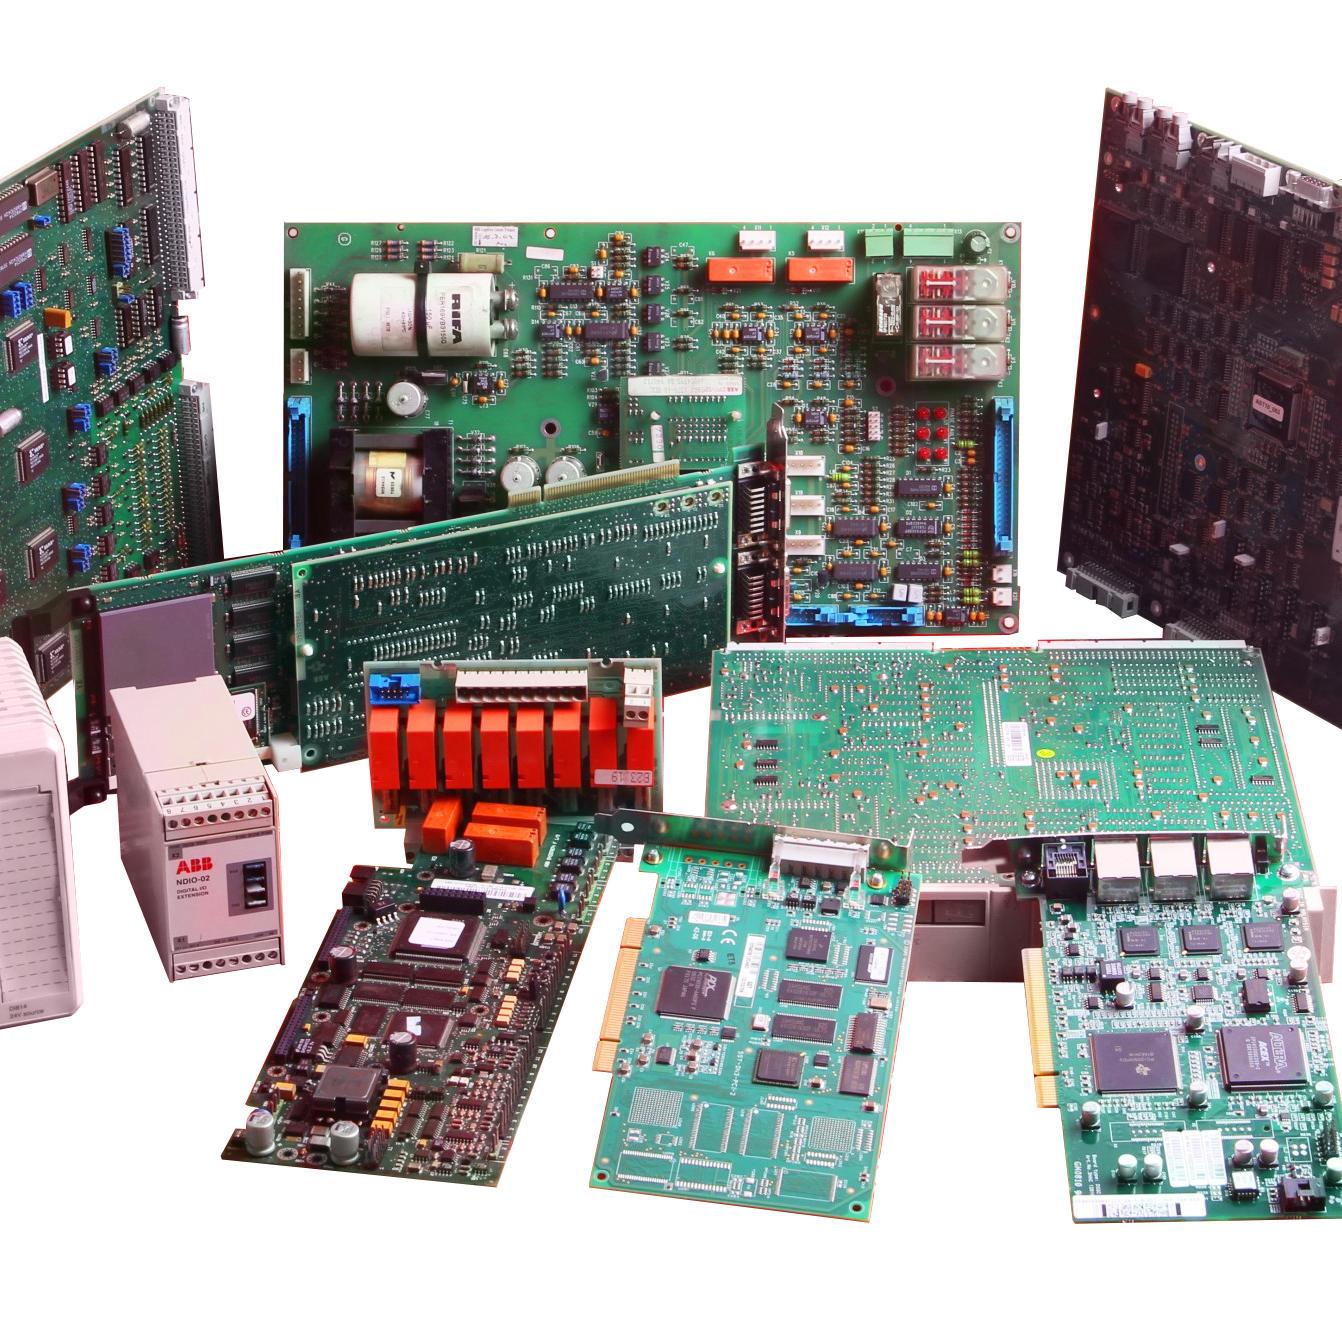 A-B   1394C-SJT22-A  全新原装进口备件模块